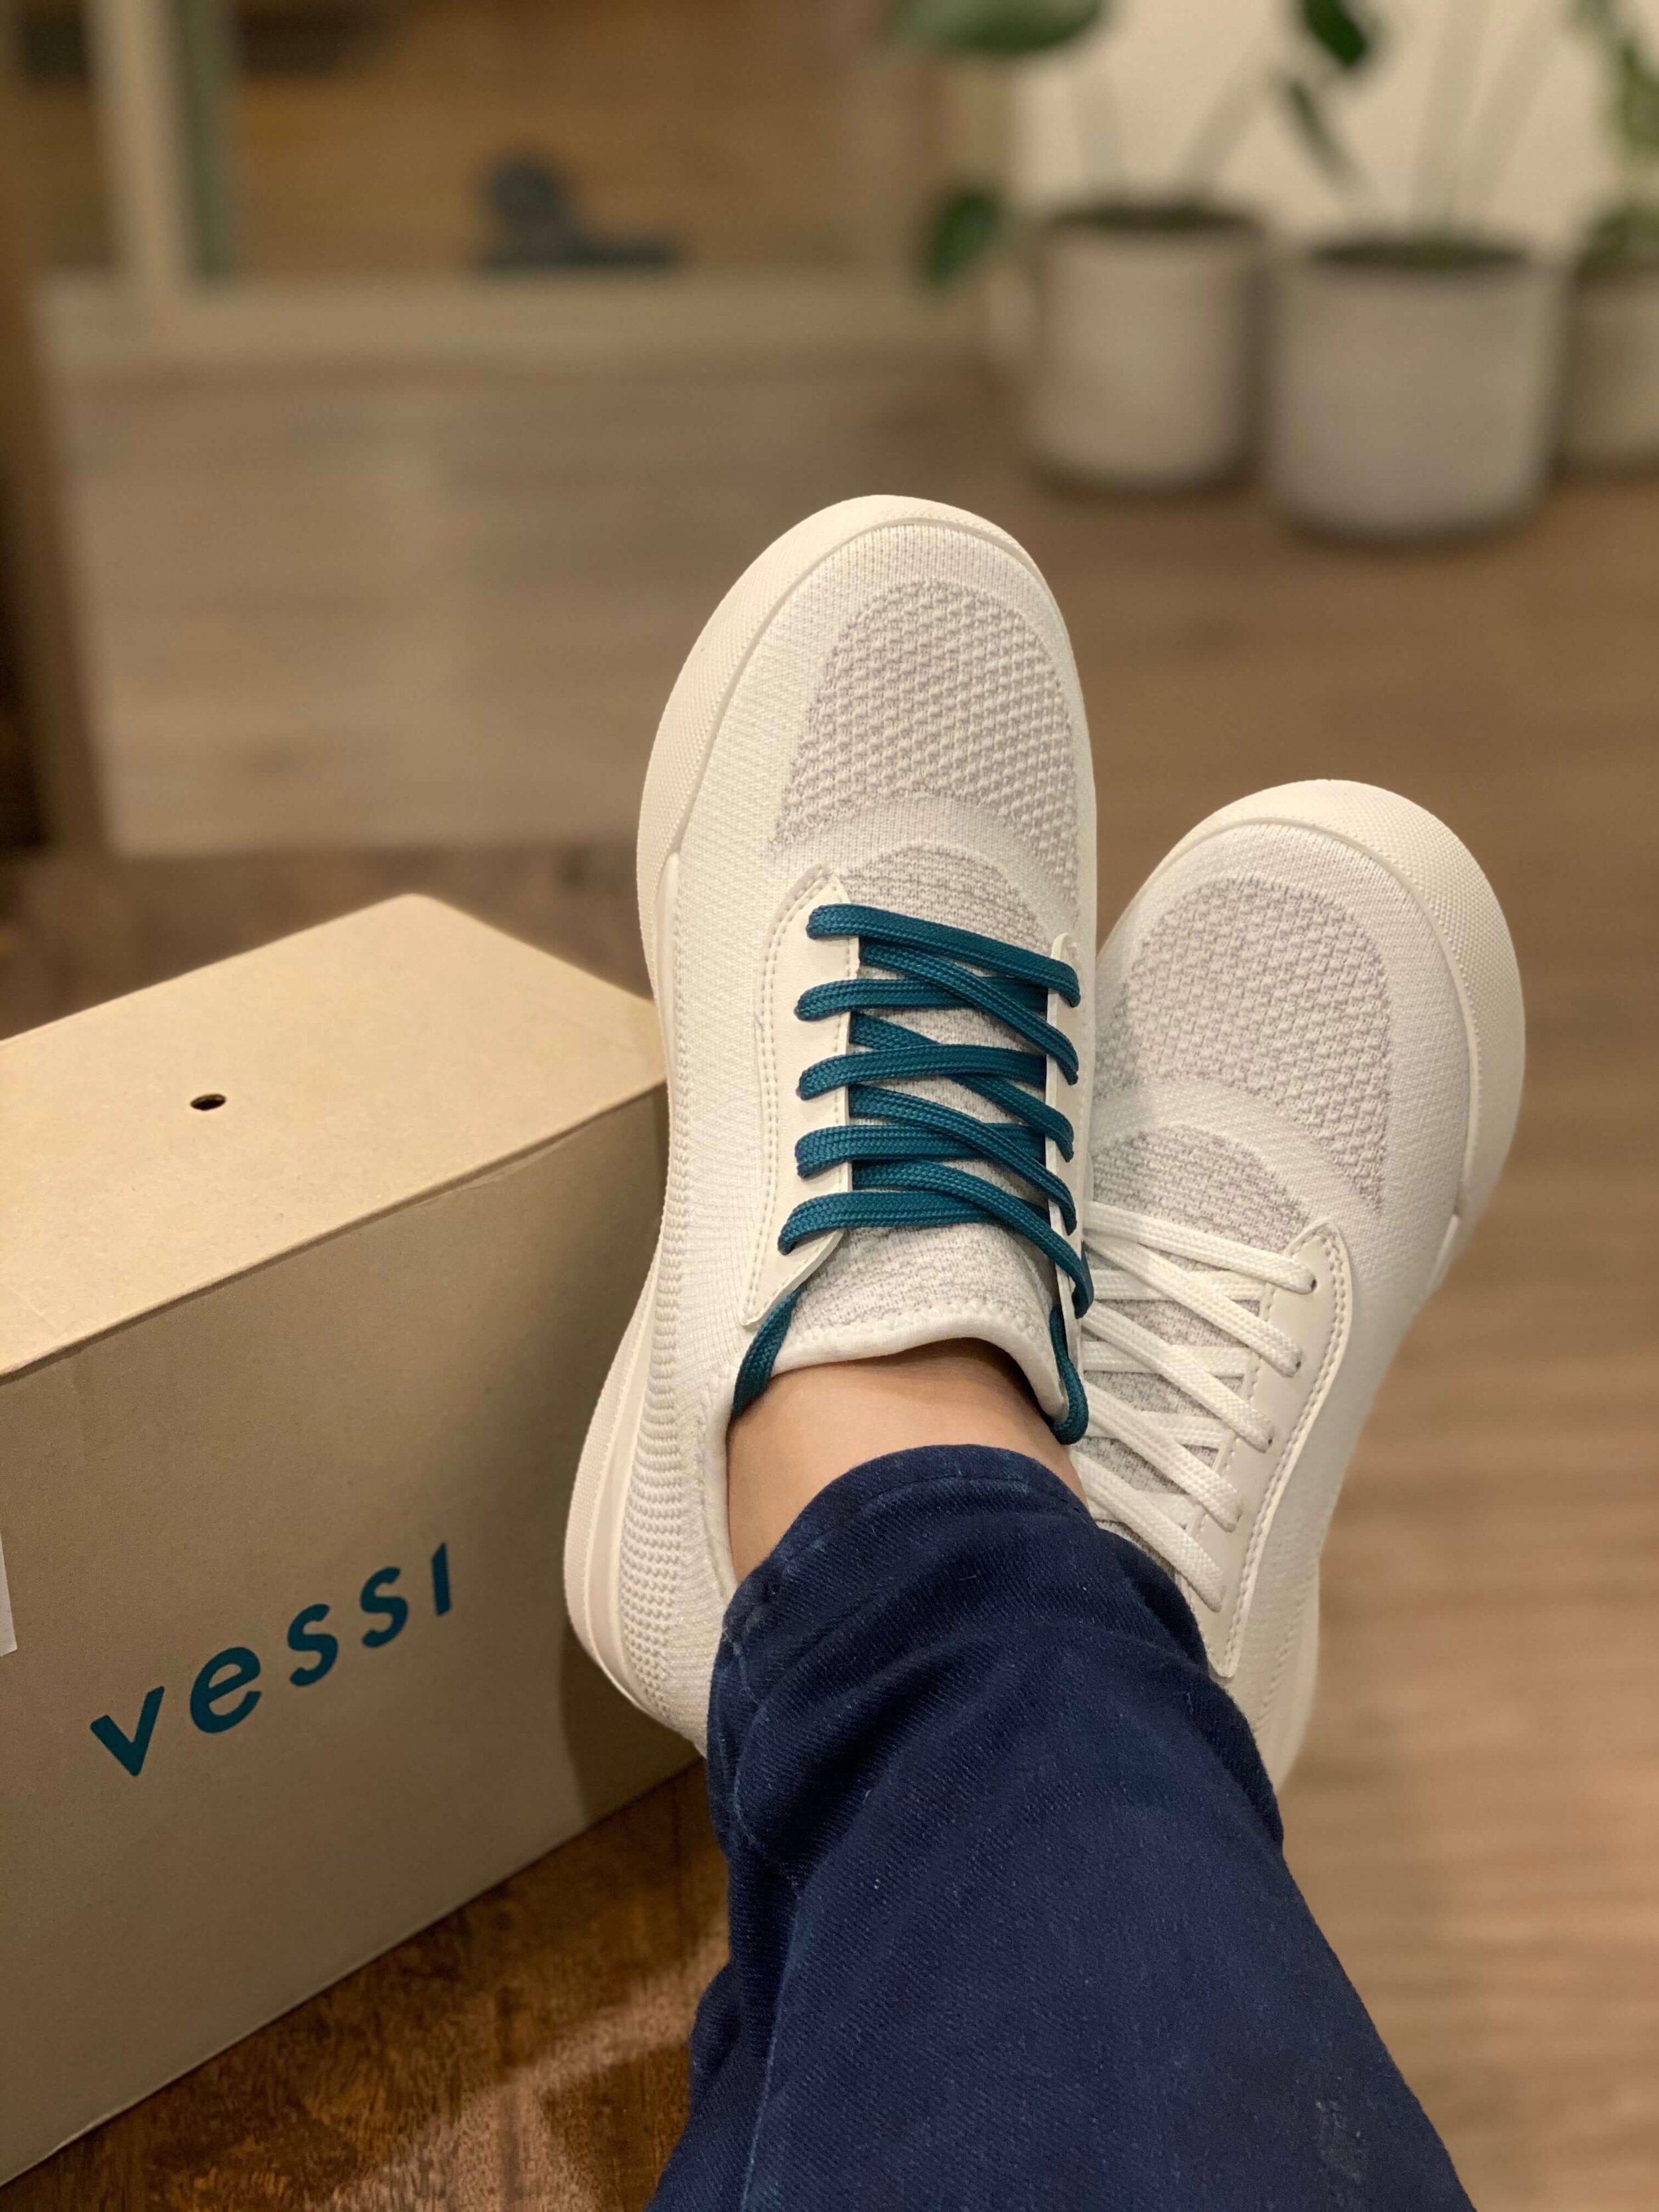 vessi sneakers review